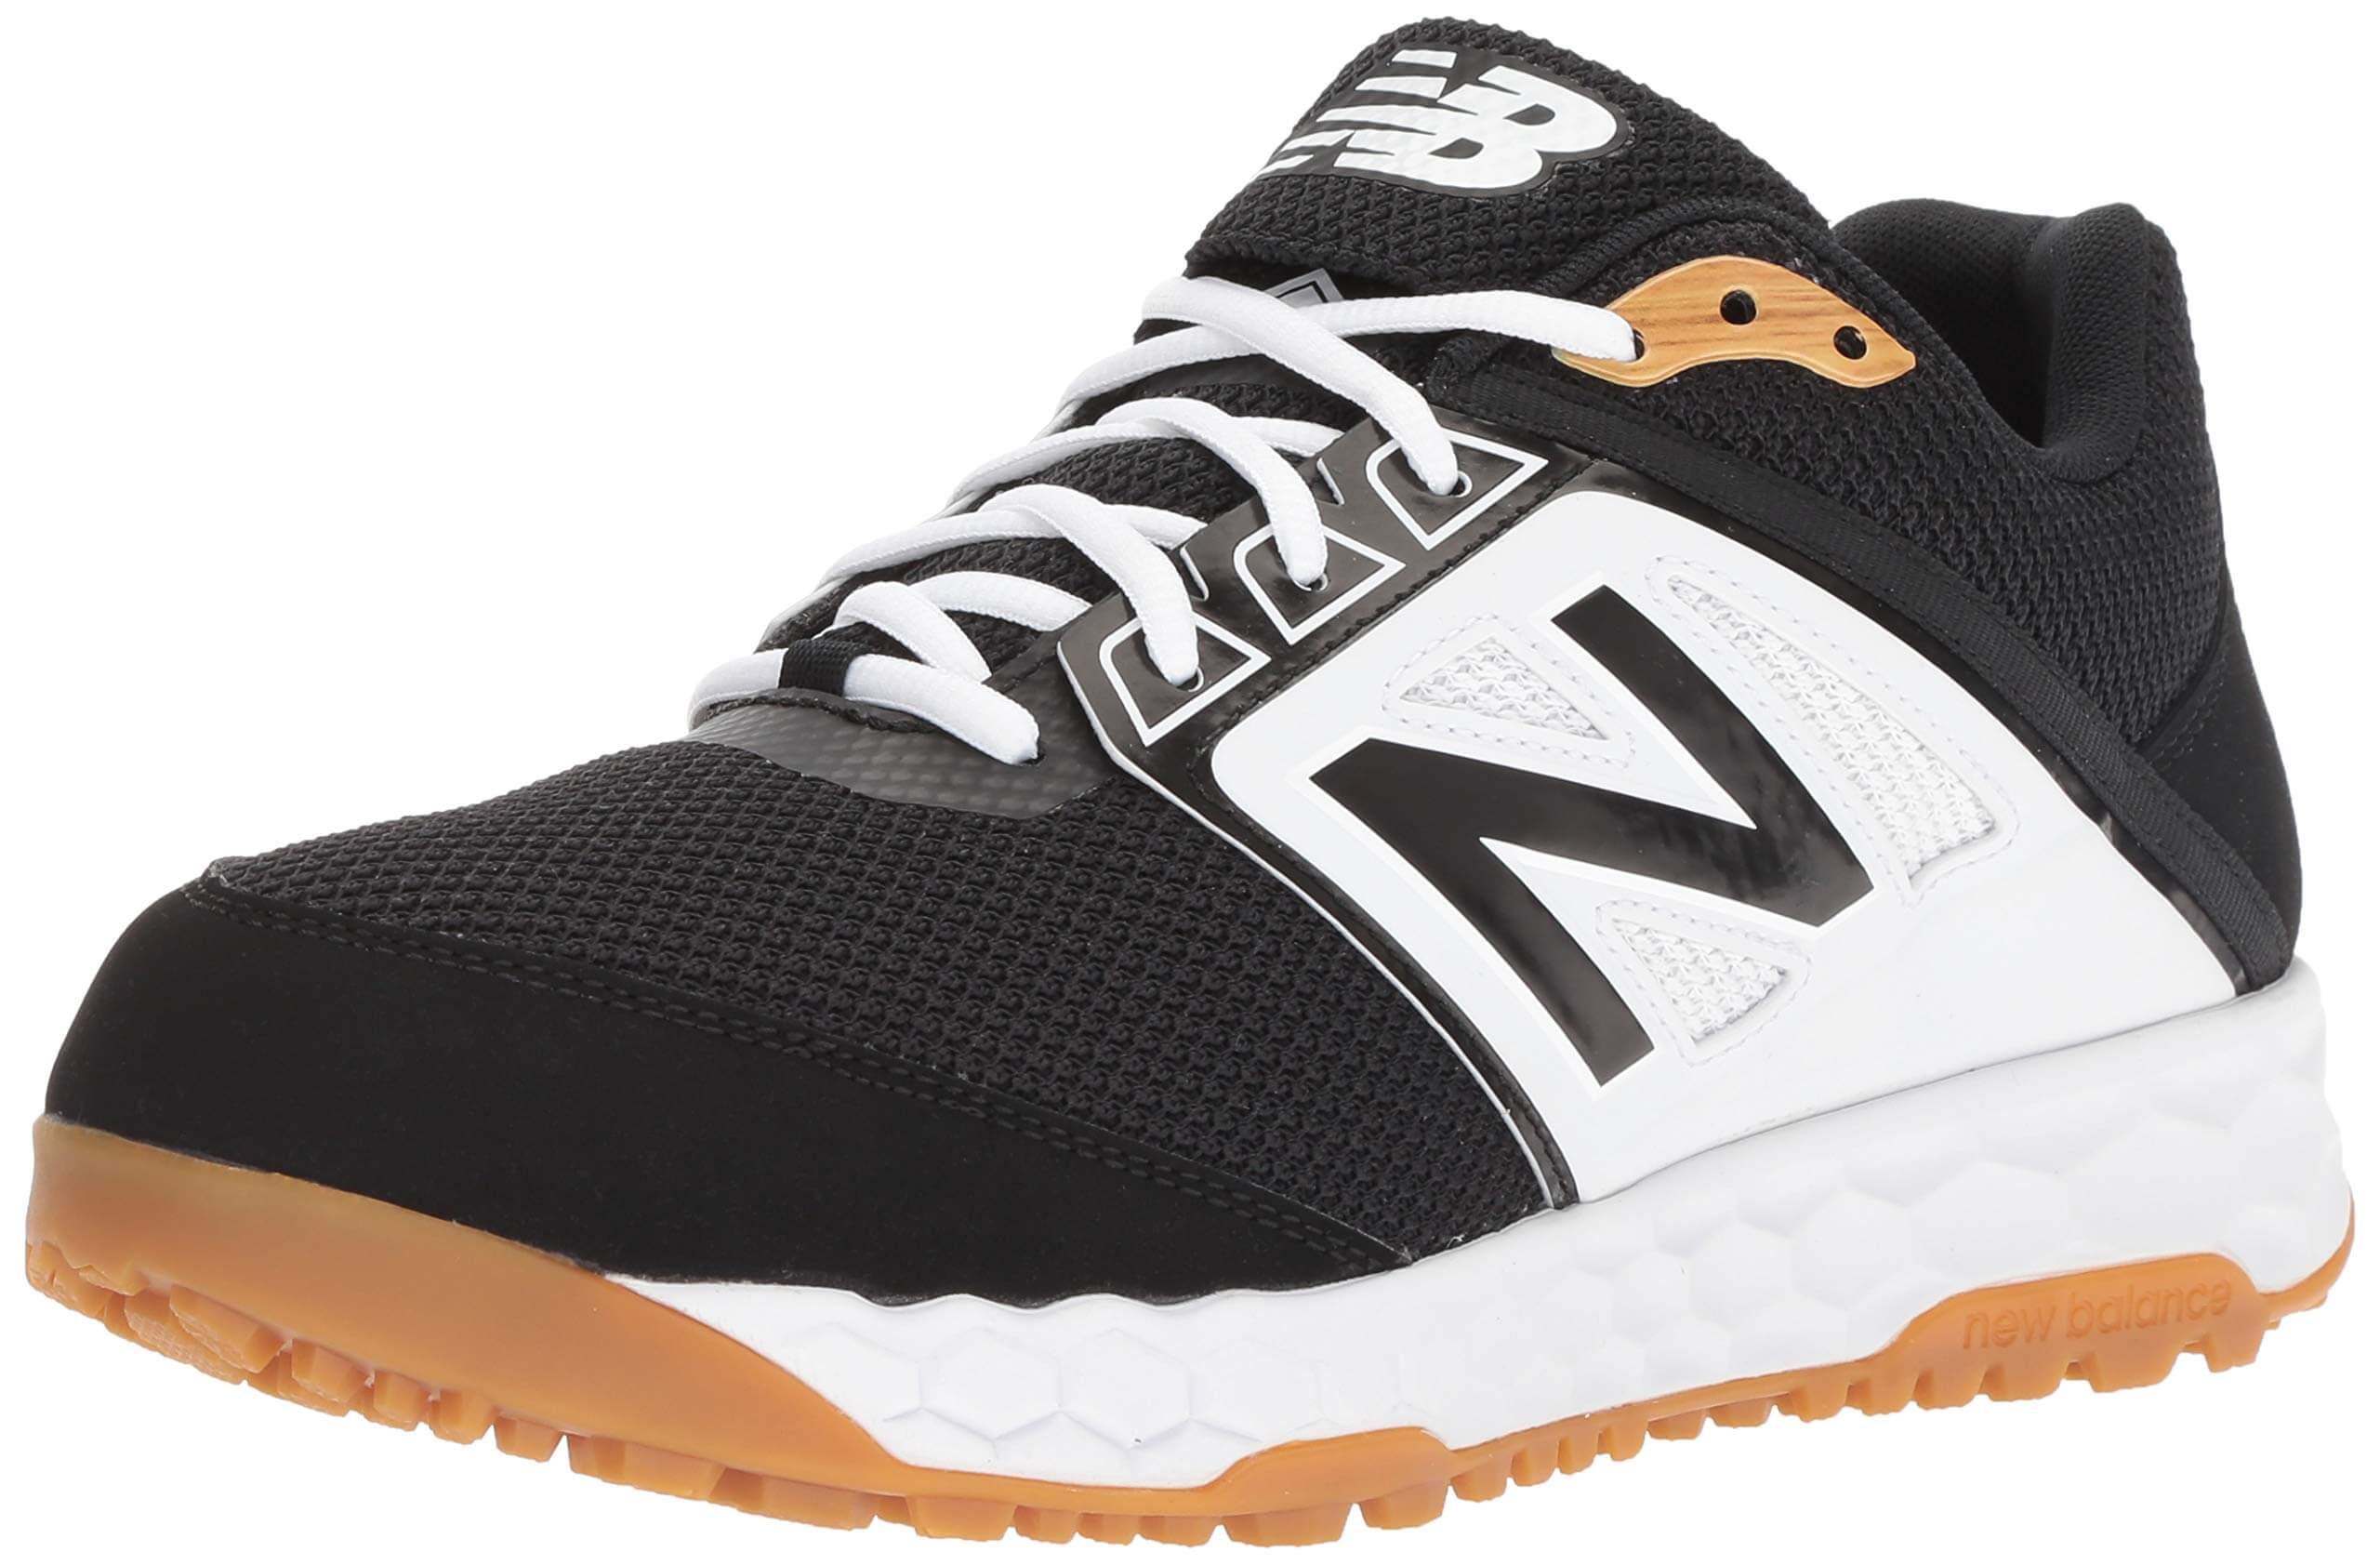 New Balance Men's 3000 V4 Turf Baseball Shoe